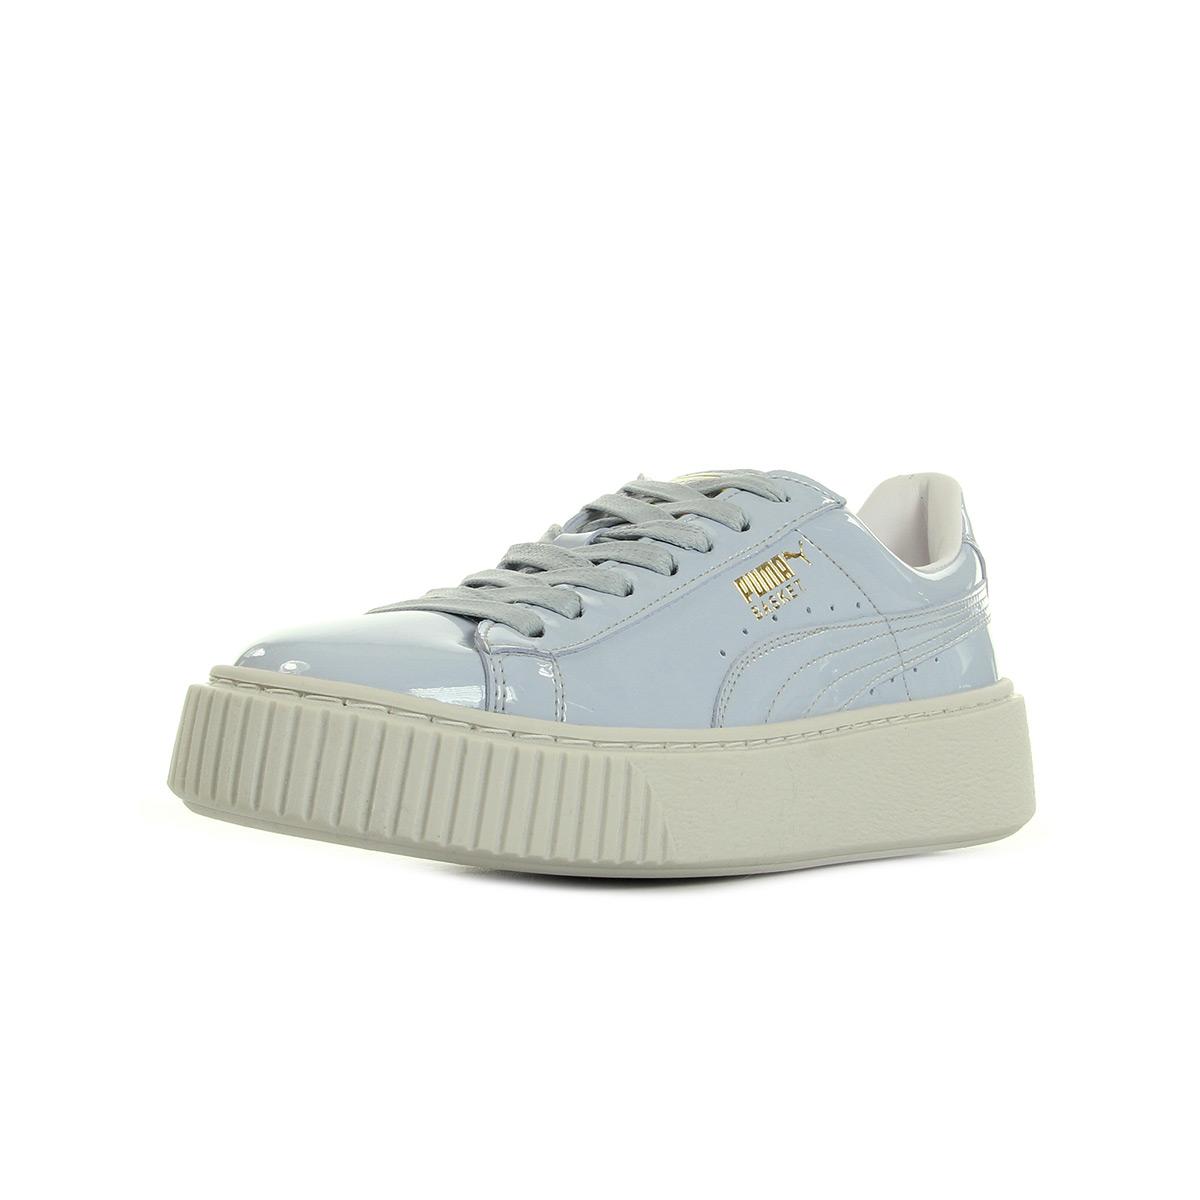 Details zu Schuhe Puma Damen Basket Platform Patent Wns blau